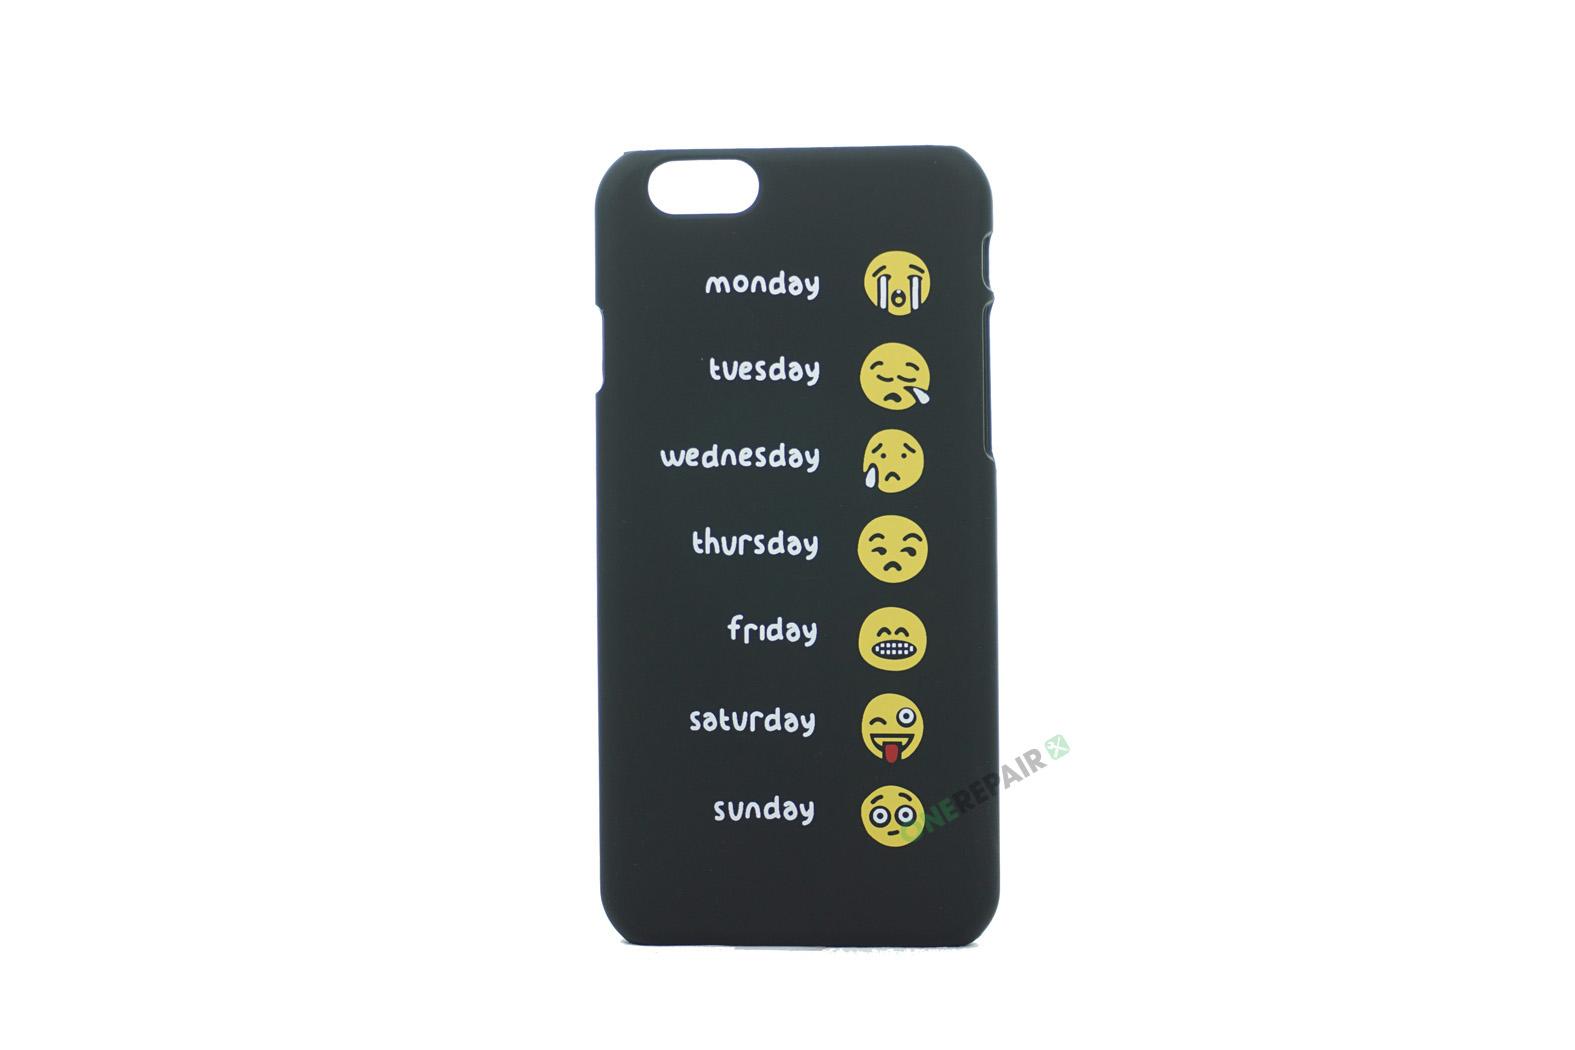 iPhone 6, 6S, A1549, A1586, A1589, A1633, A1688, A1700, A1691, Apple, Bagcover, Cover, Motiv, Sjov, Billig, Sort, Ugedage, Weekdays, Emoji